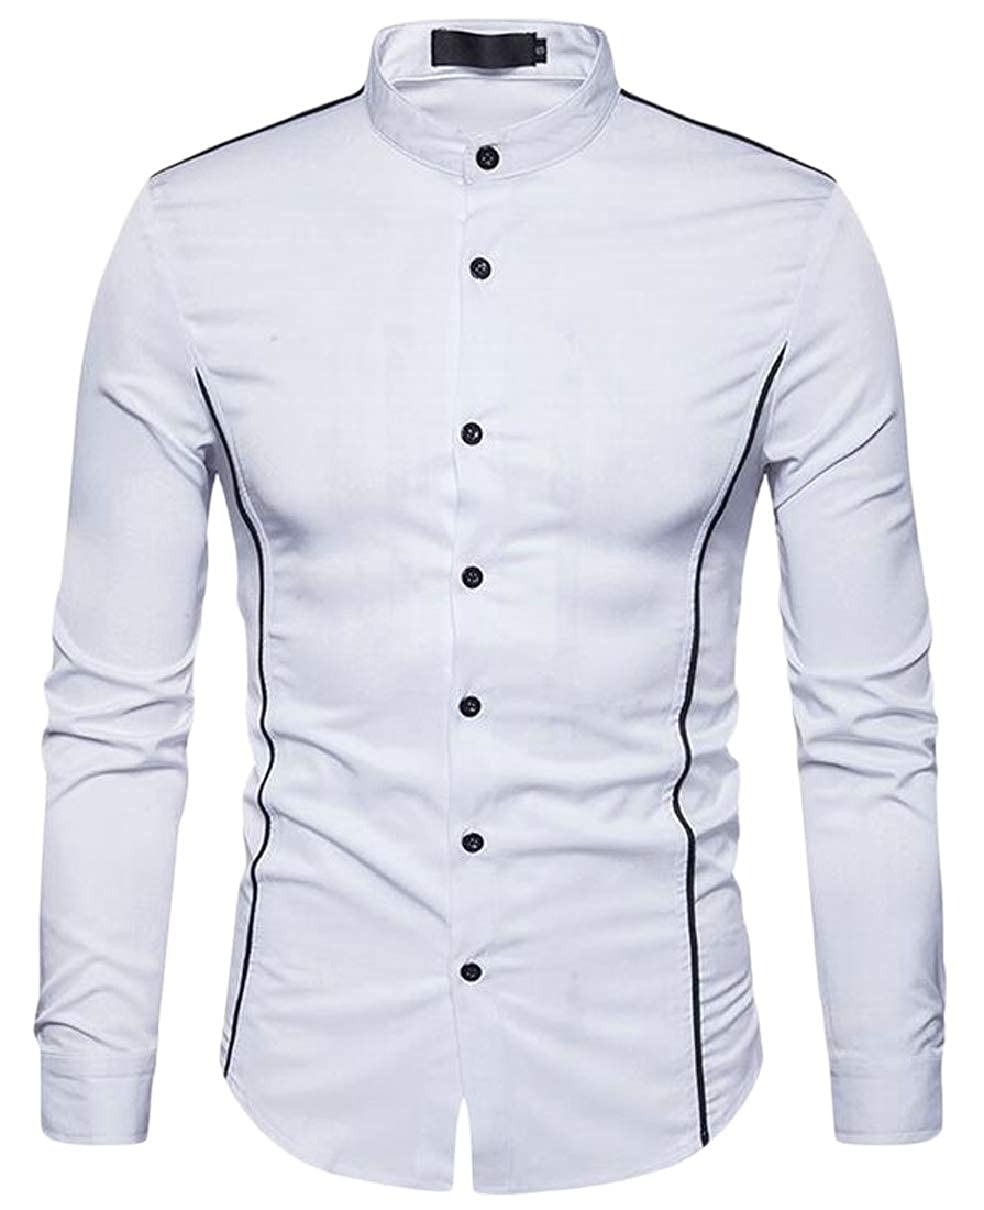 CBTLVSN Mens Casual Simple Slim Long Sleeve Button Down Dress Shirt